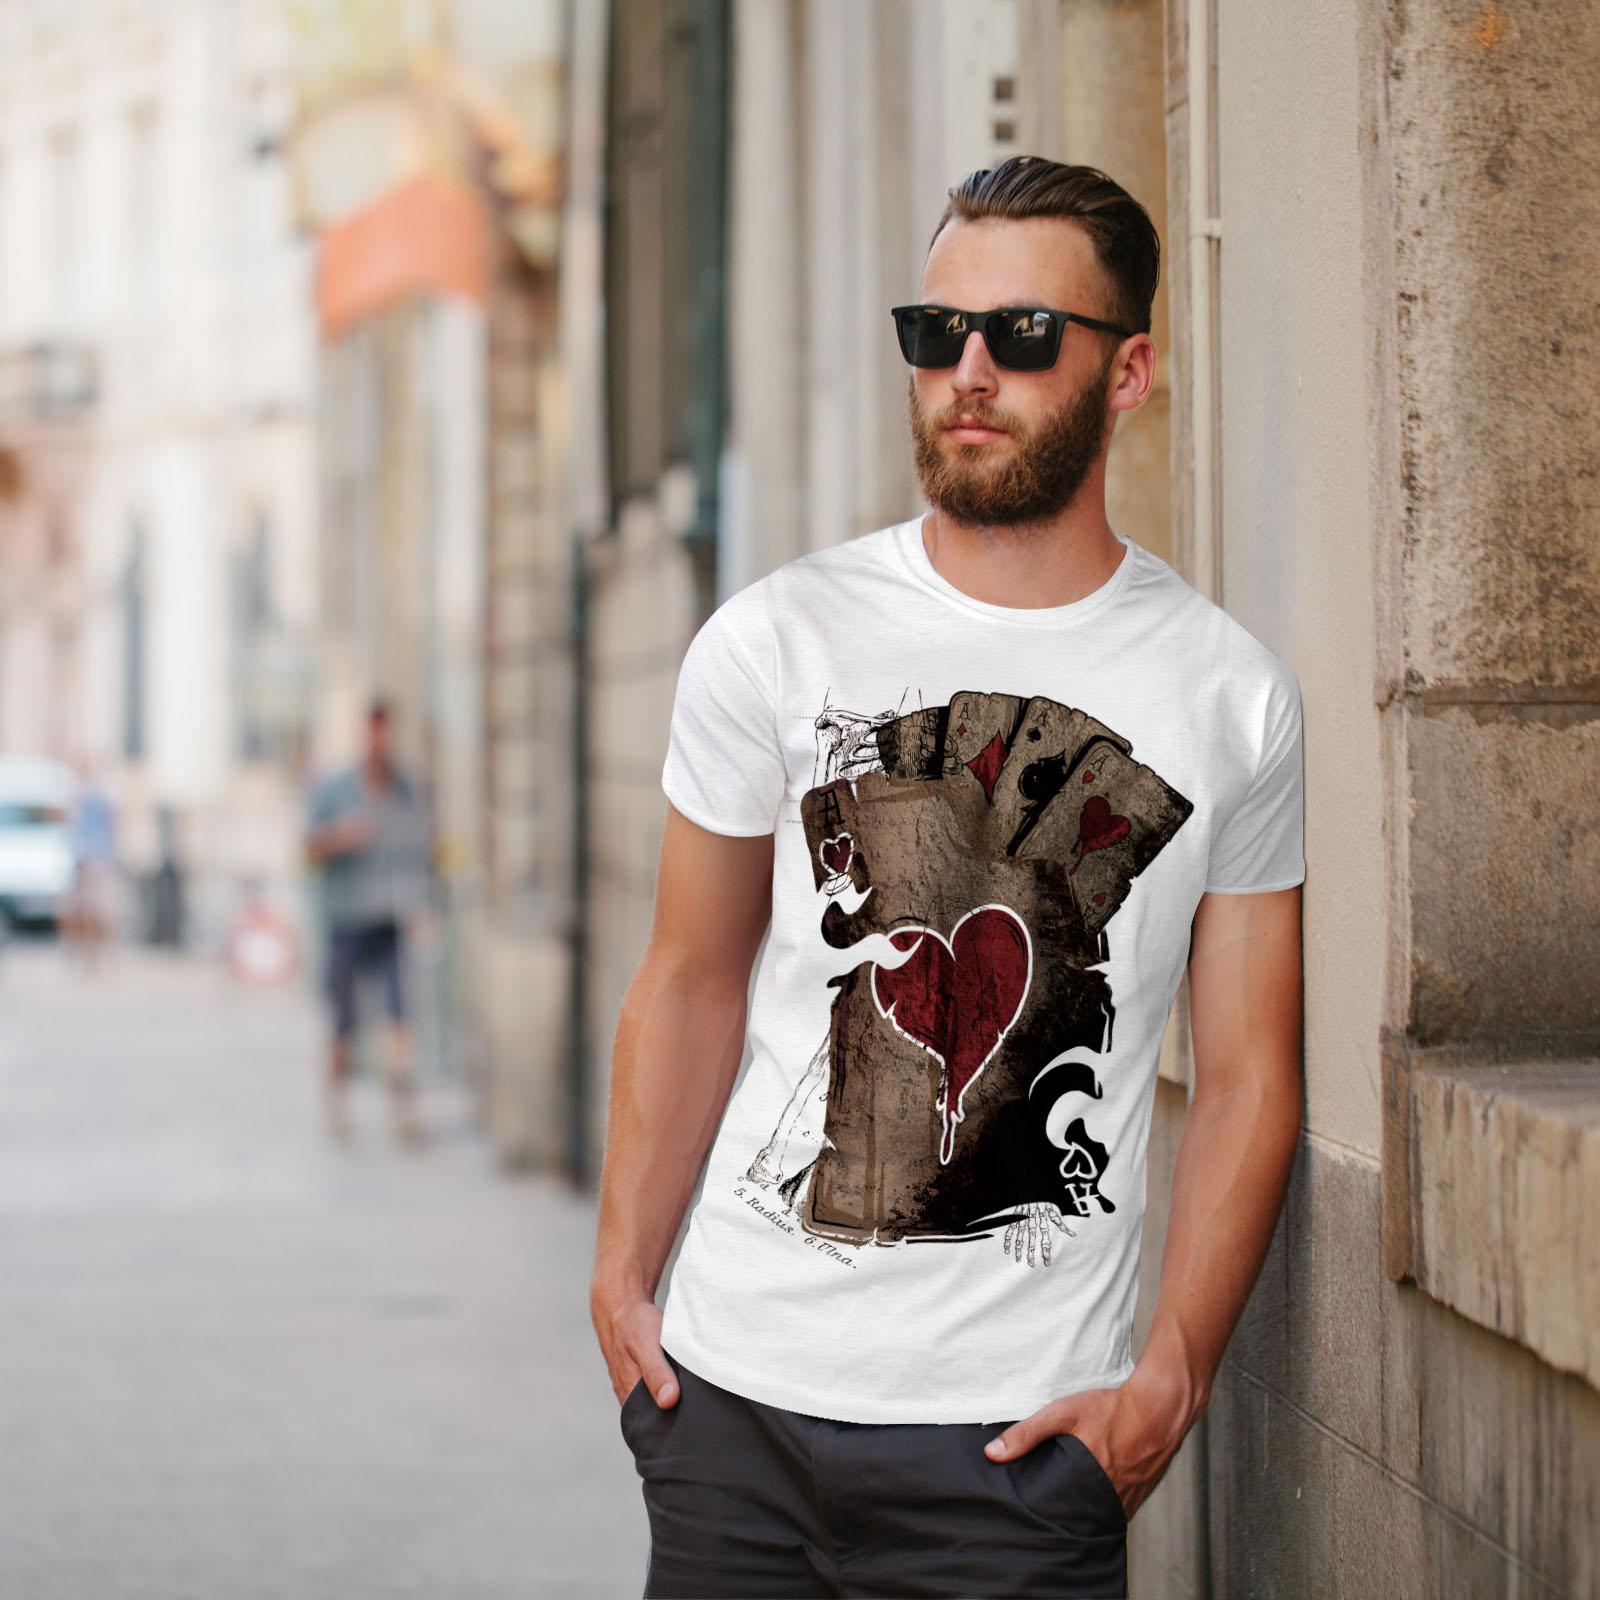 Wellcoda-Poker-Gamble-Squelette-T-shirt-homme-effrayant-conception-graphique-imprime-Tee miniature 11